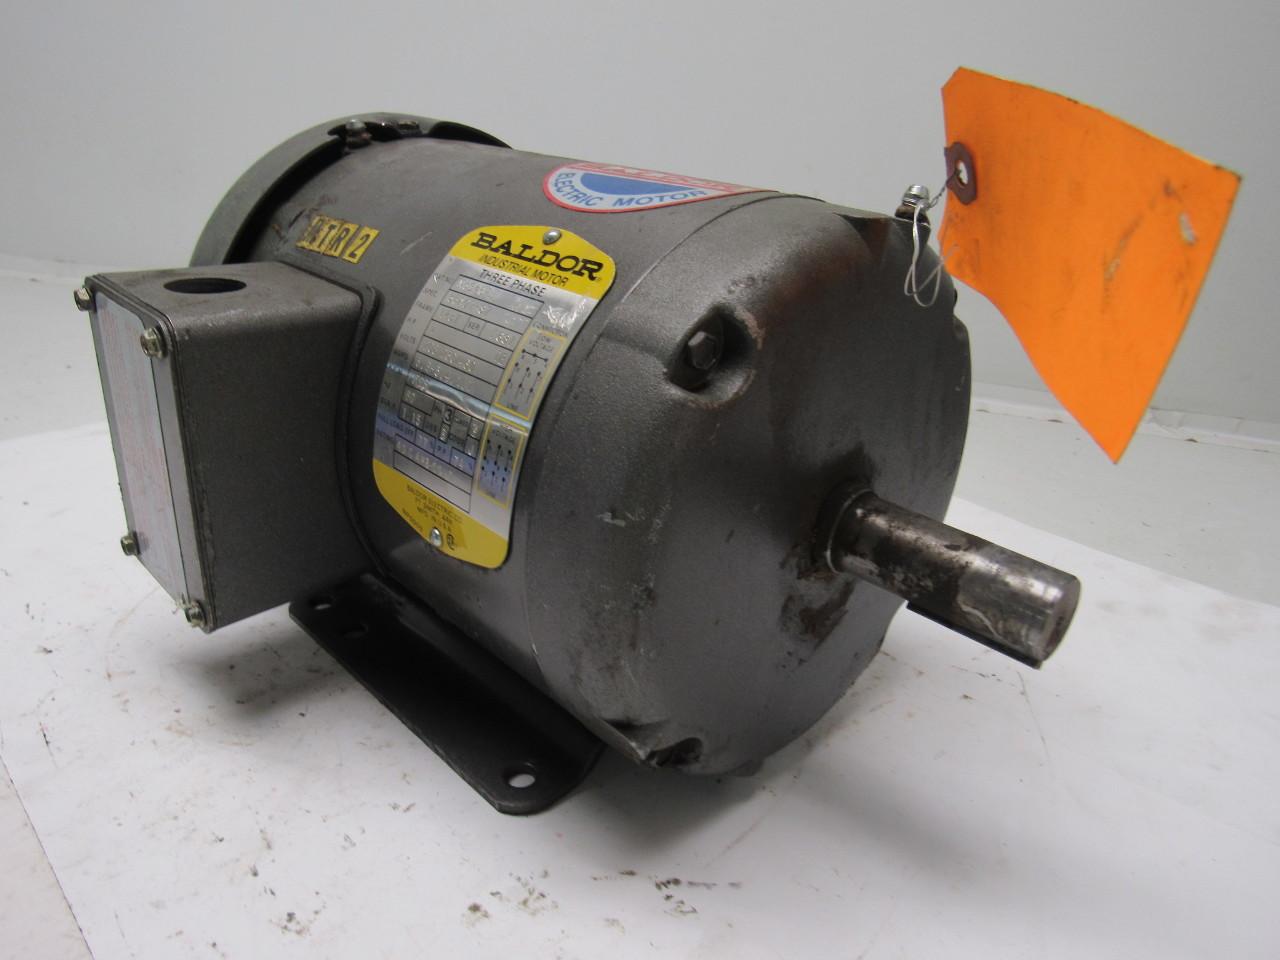 Baldor M3546t 1hp Electric Motor 3ph 208 230 460v 1725 Rpm